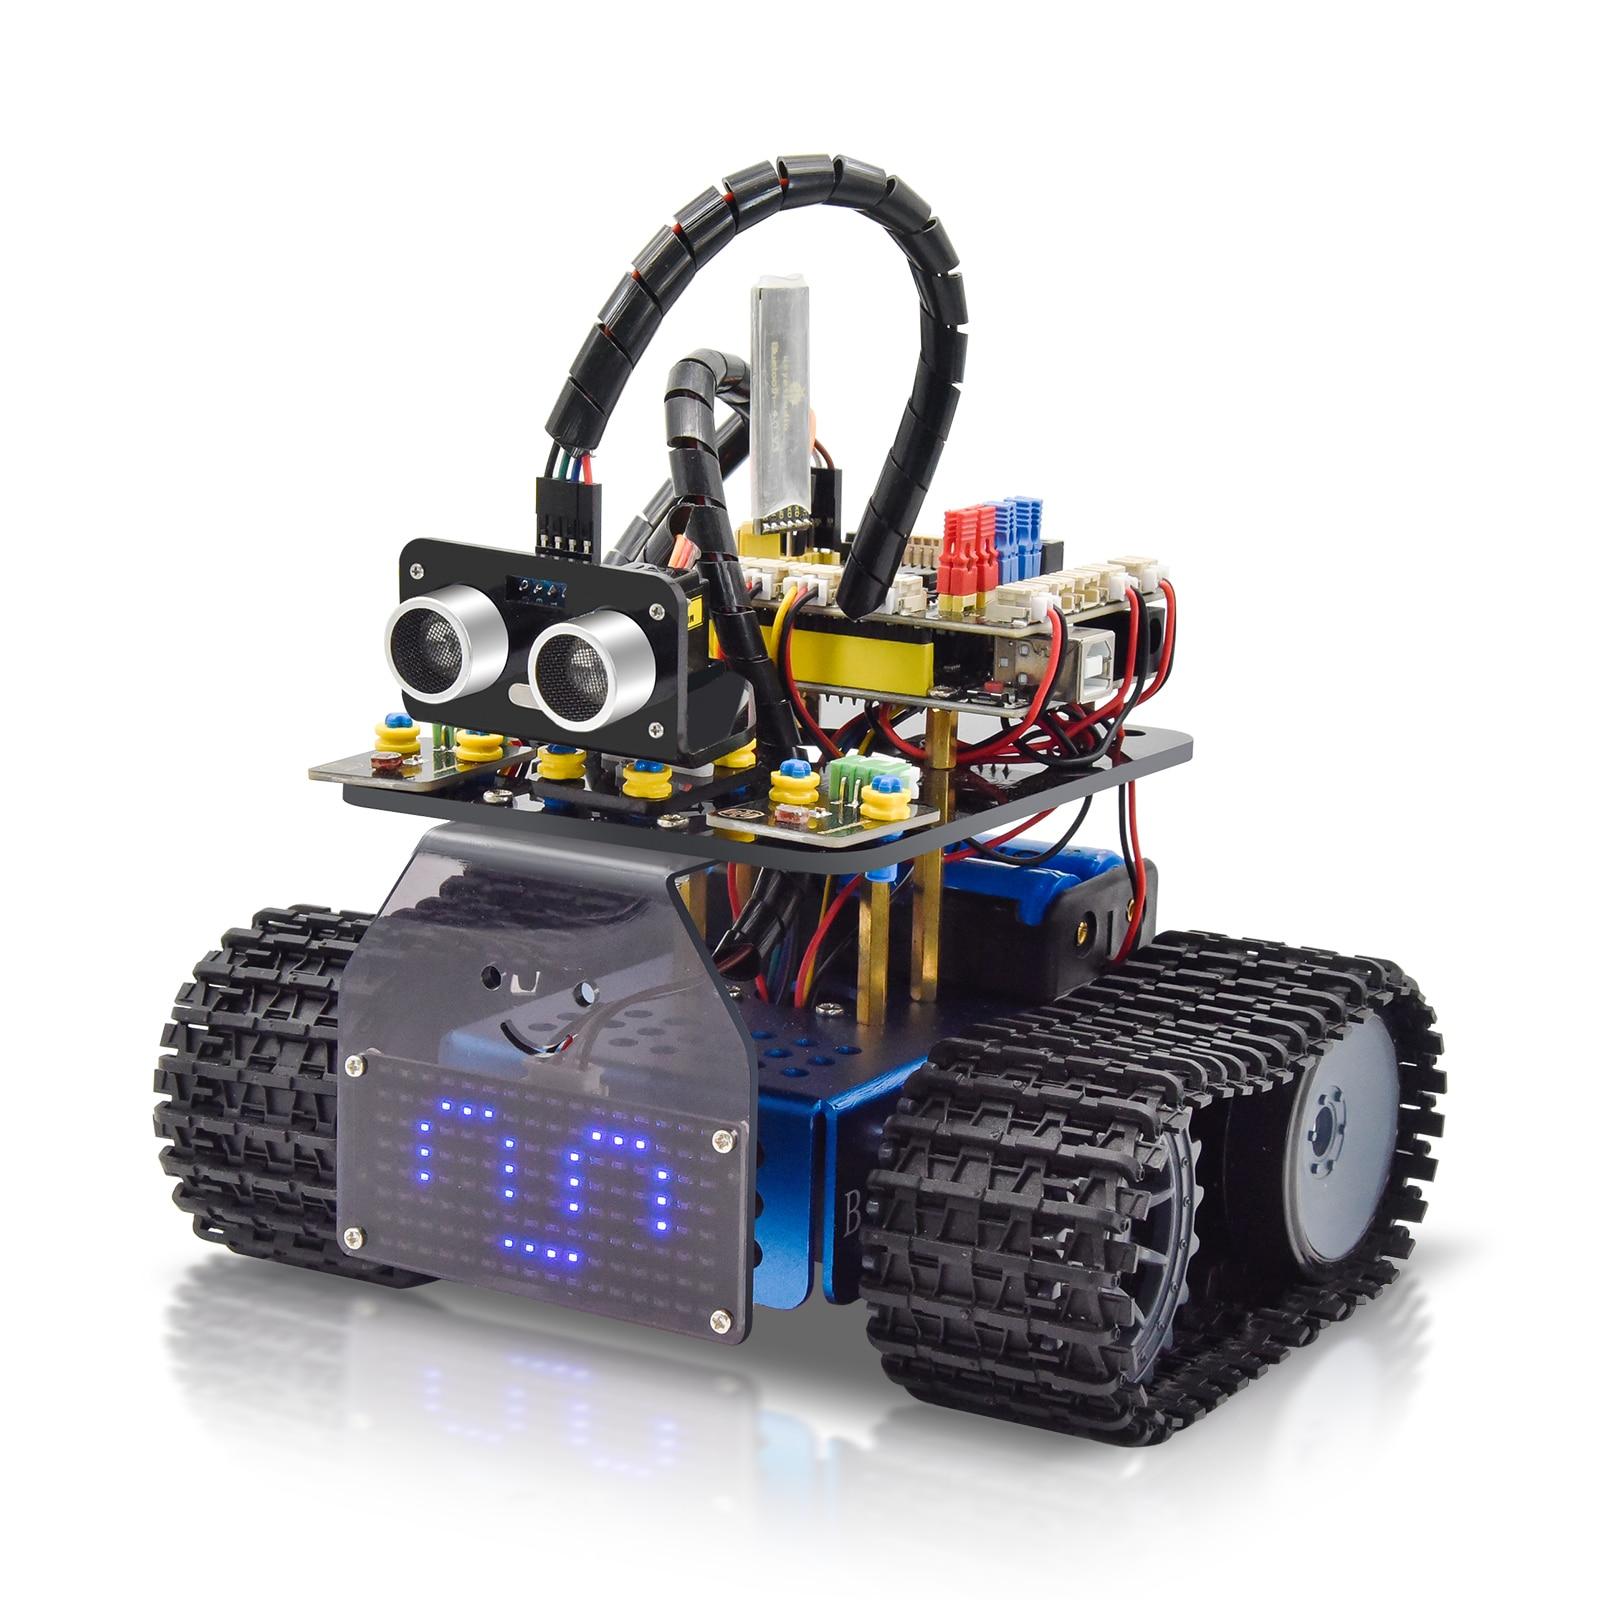 New Keyestudio Mini Smart Tank Robot V3.0 Kit  For Arduino Robot Car DIY Programmable STEM Toys Compatible With Arduino&Mixly